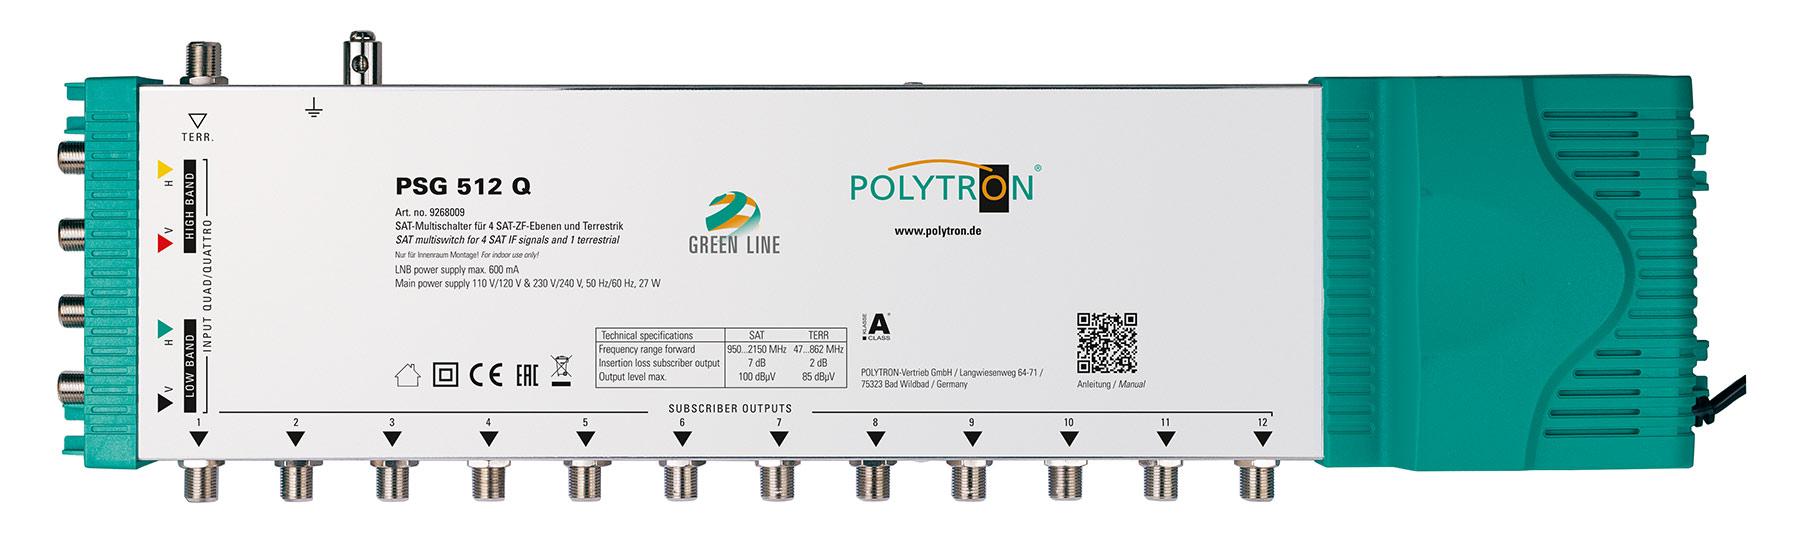 PSG 512Q Πολυδιακόπτης 5/12 (1Δορυφόροι+ Επίγεια-12Εξόδους)POLYTRON